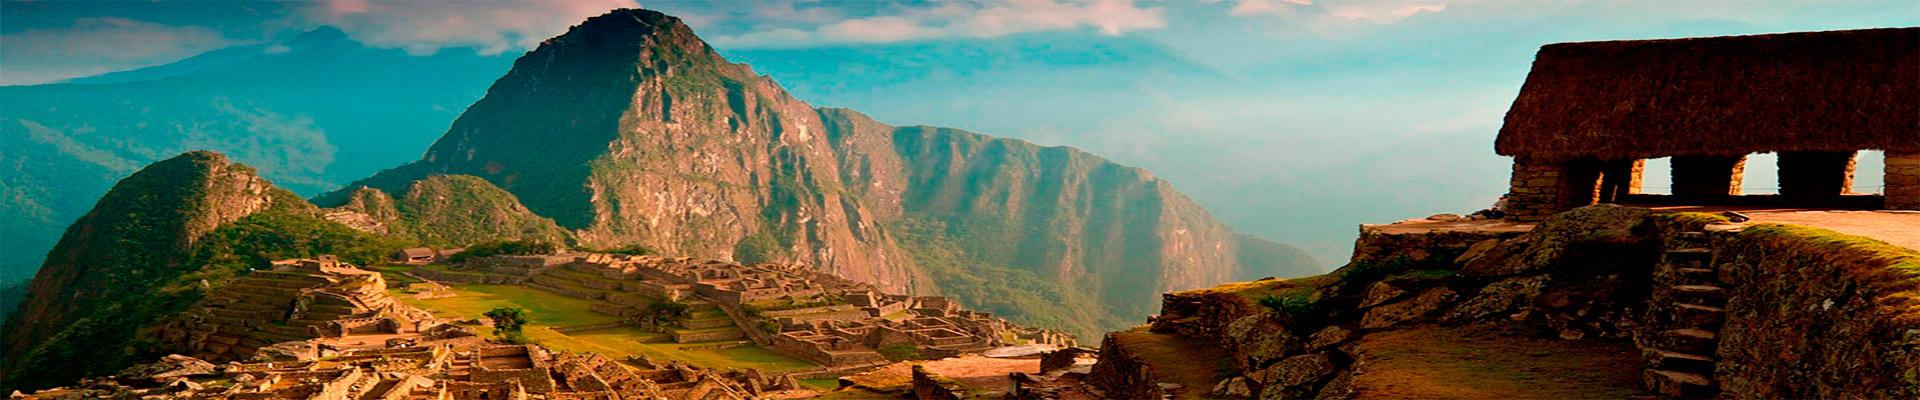 Trilha Inca, Trilha Lares e Rota Moche